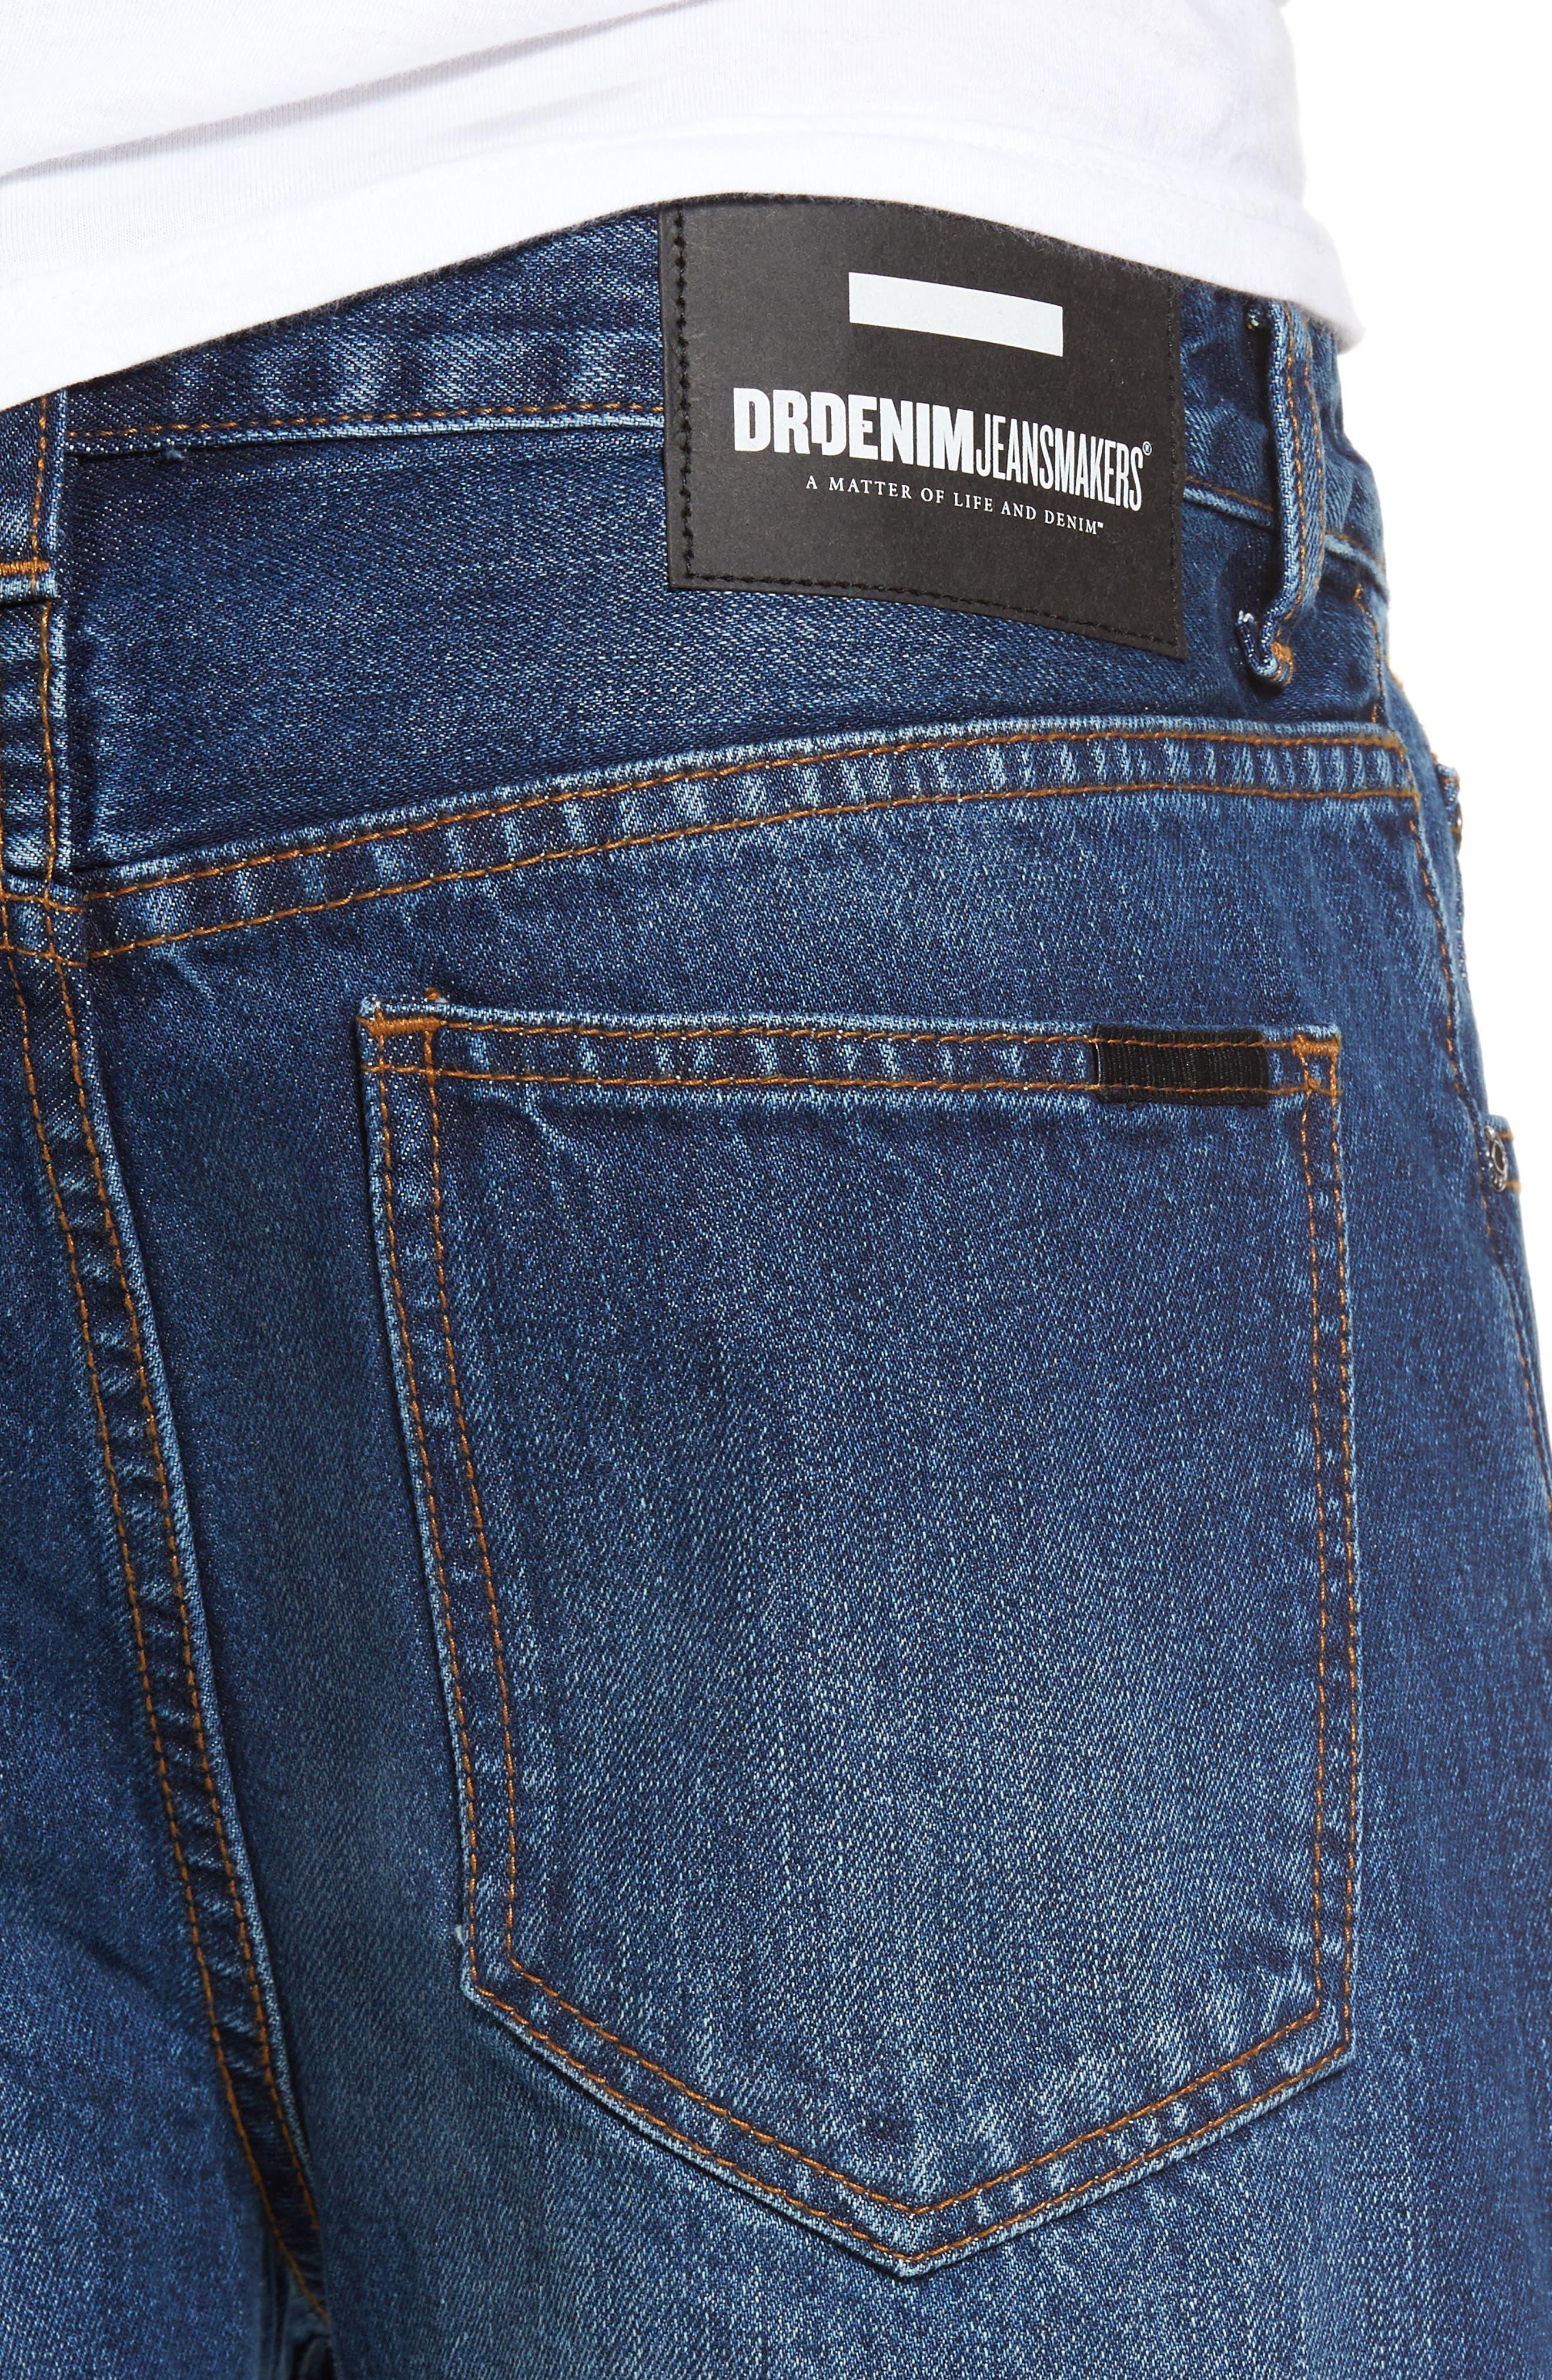 Otis Straight Fit Crop Jeans,                             Alternate thumbnail 4, color,                             Worn Mid Blue Raw Hem